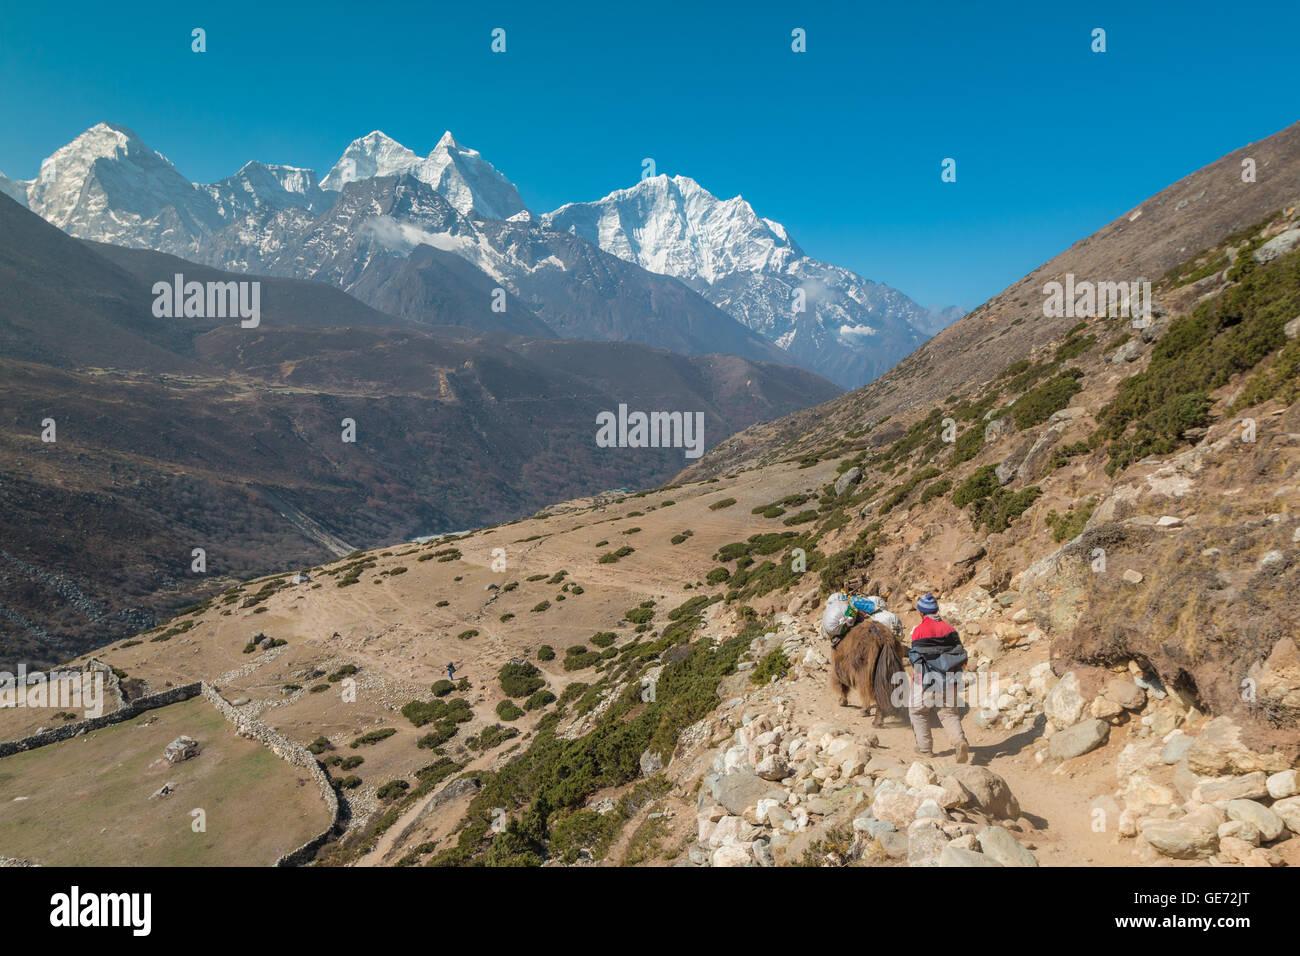 Everest Base camp hiking in Nepal - Stock Image